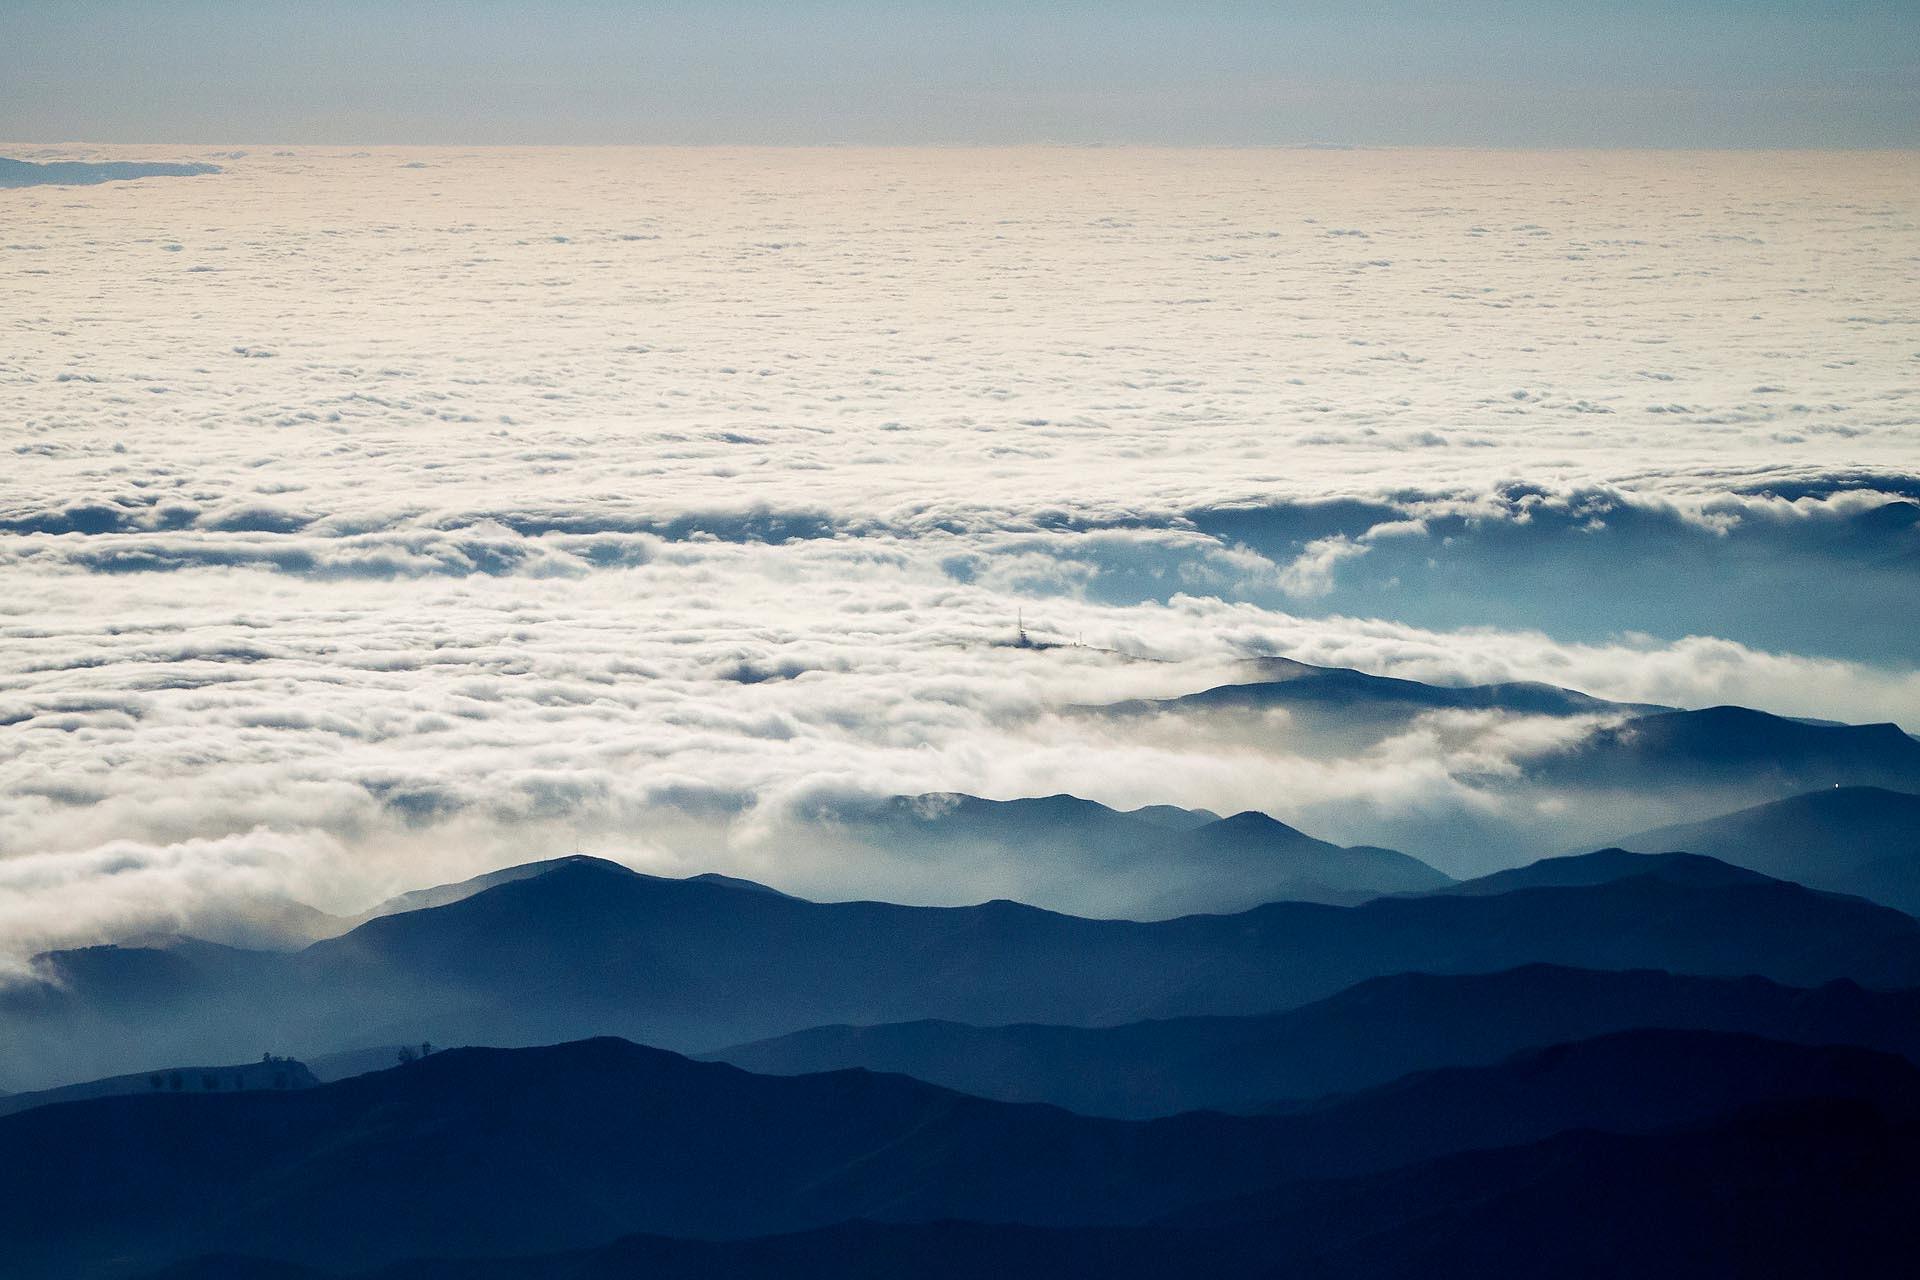 Aerial_PhillipAngert - 5.jpg